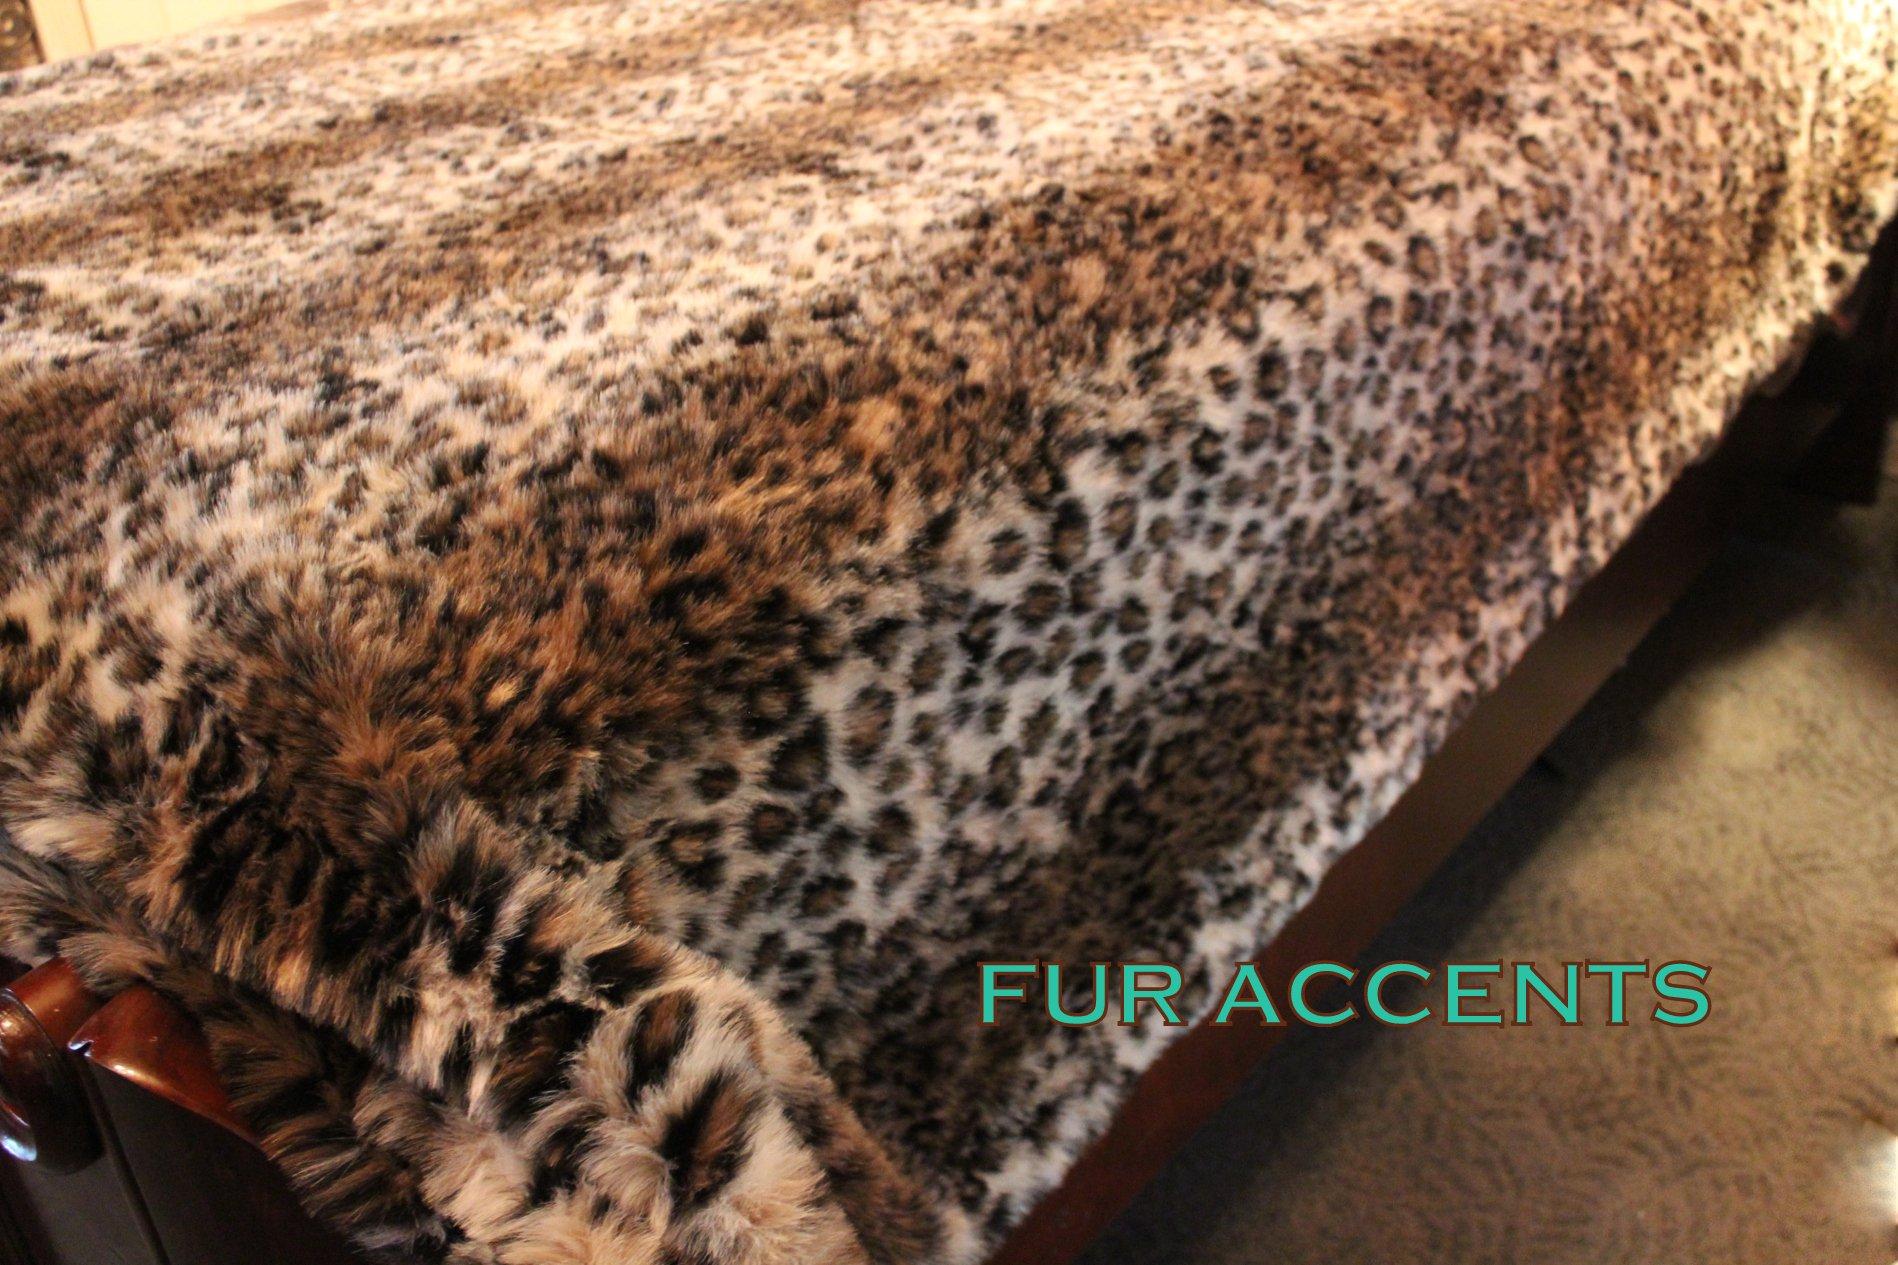 Fur Accents Faux Fur King Size Bedspread / Throw Blanket / Leopard /96'' X 120'' King Size